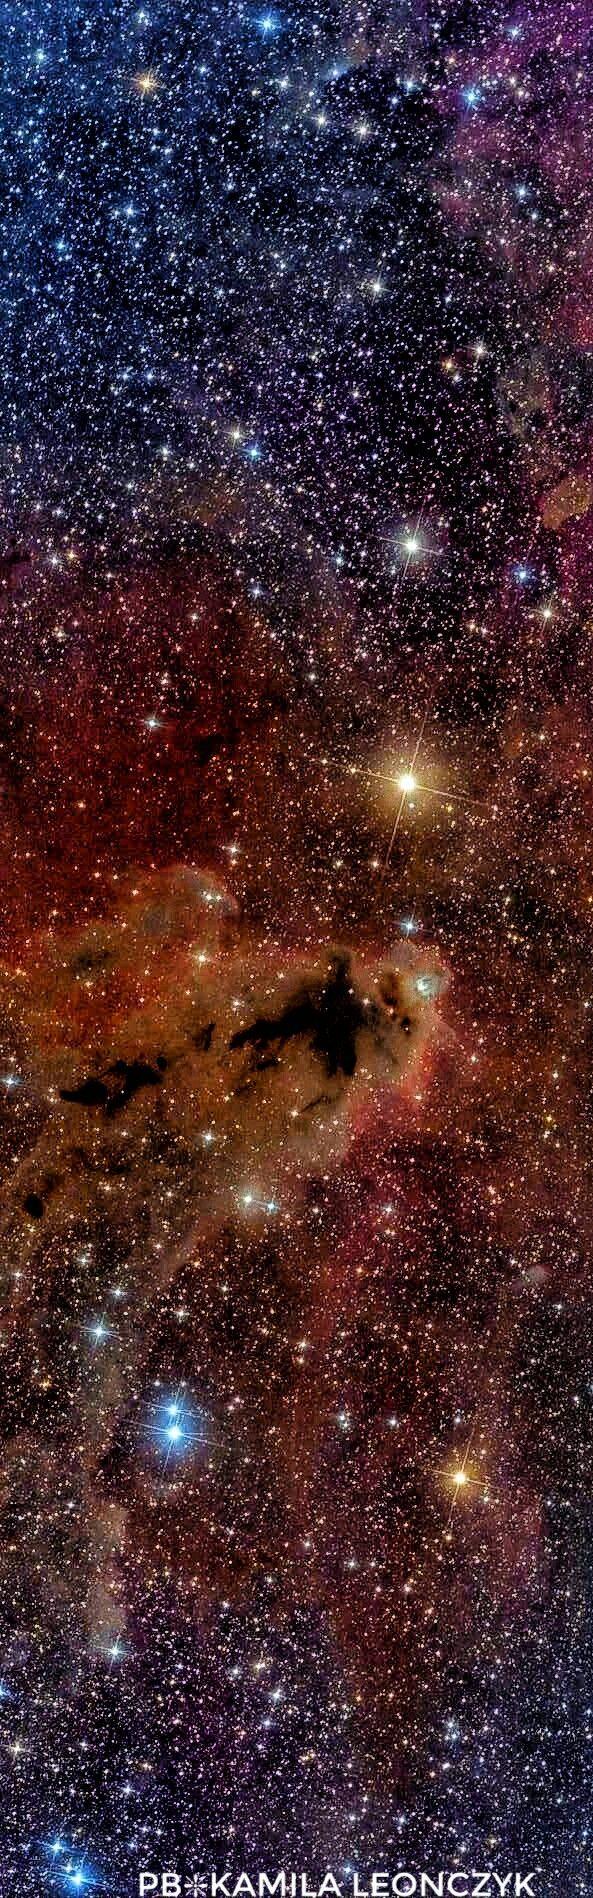 Dark Nebula LDN 1622 and Barnard's Loop Credit & Copyright: Leonardo Julio (Astronomia Pampeana)